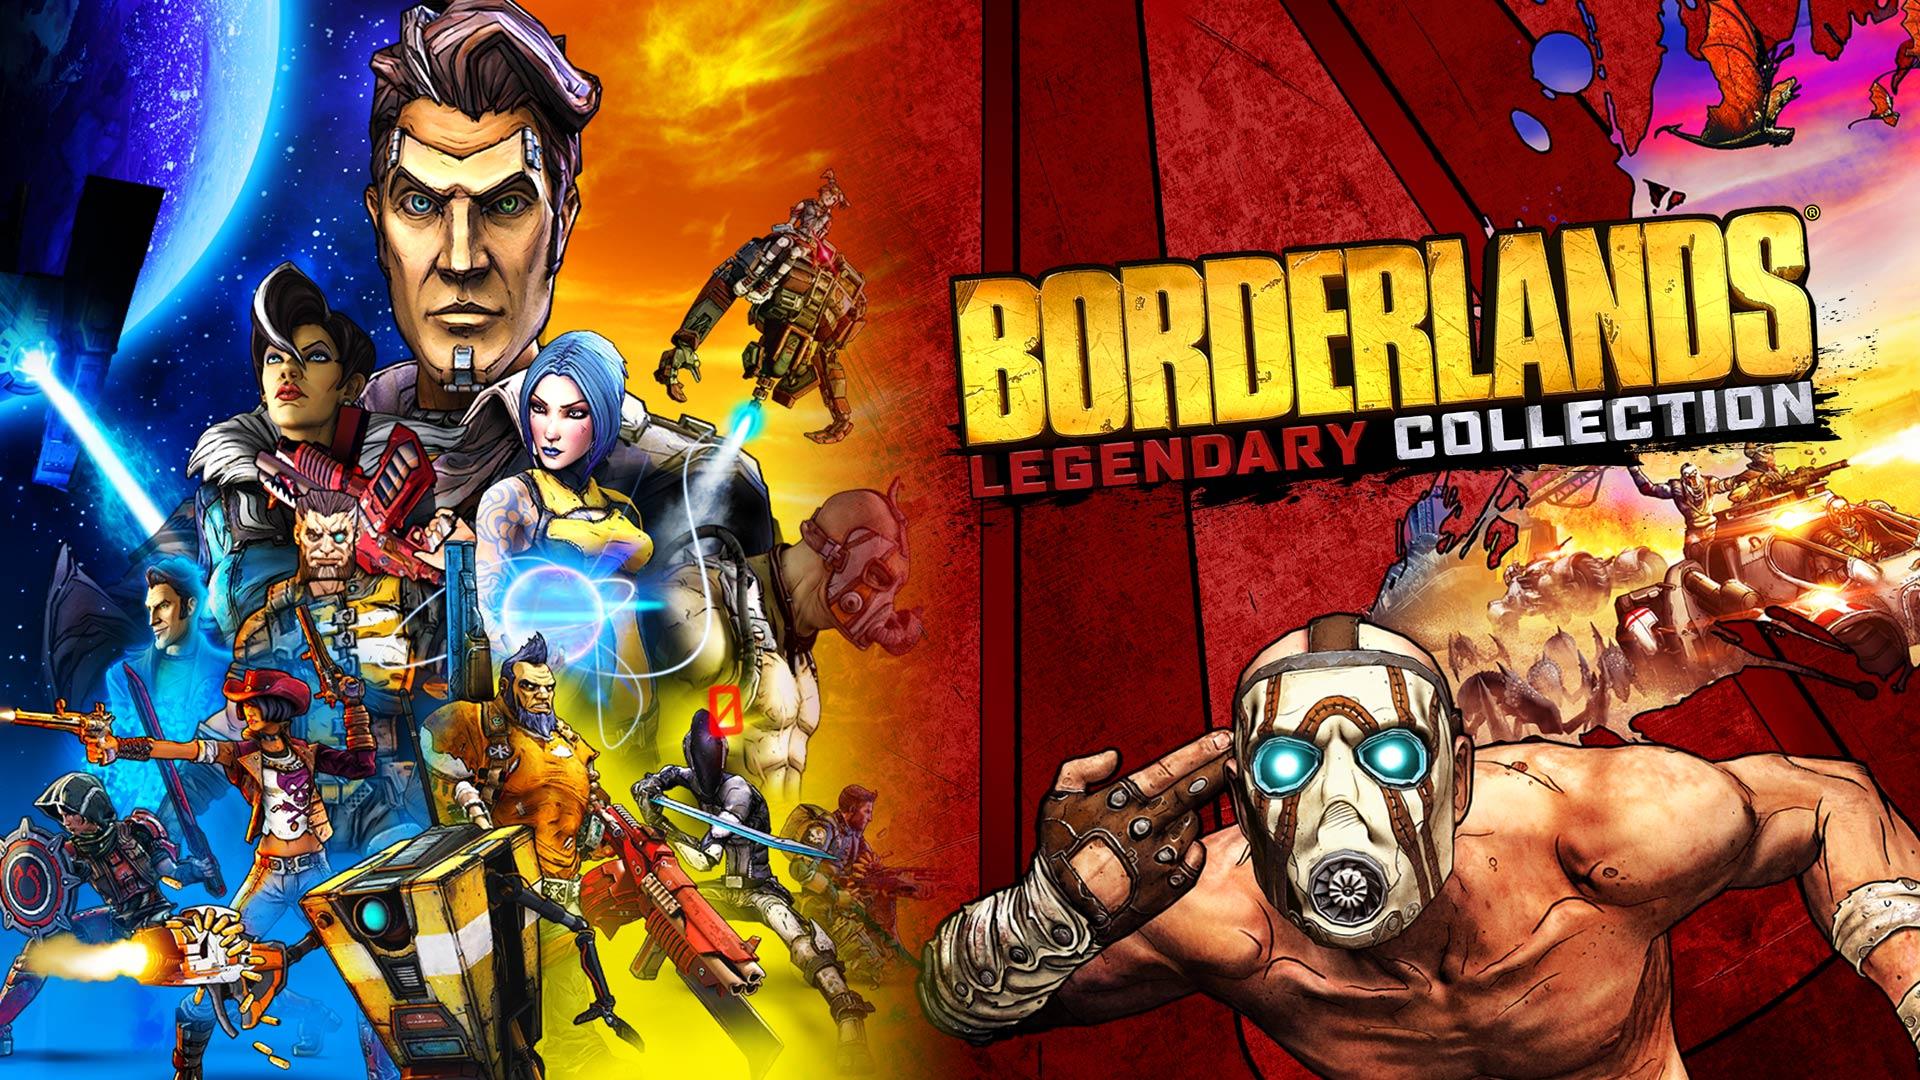 Borderlands Legendary Collection for Nintendo Switch - Nintendo Game Details $25